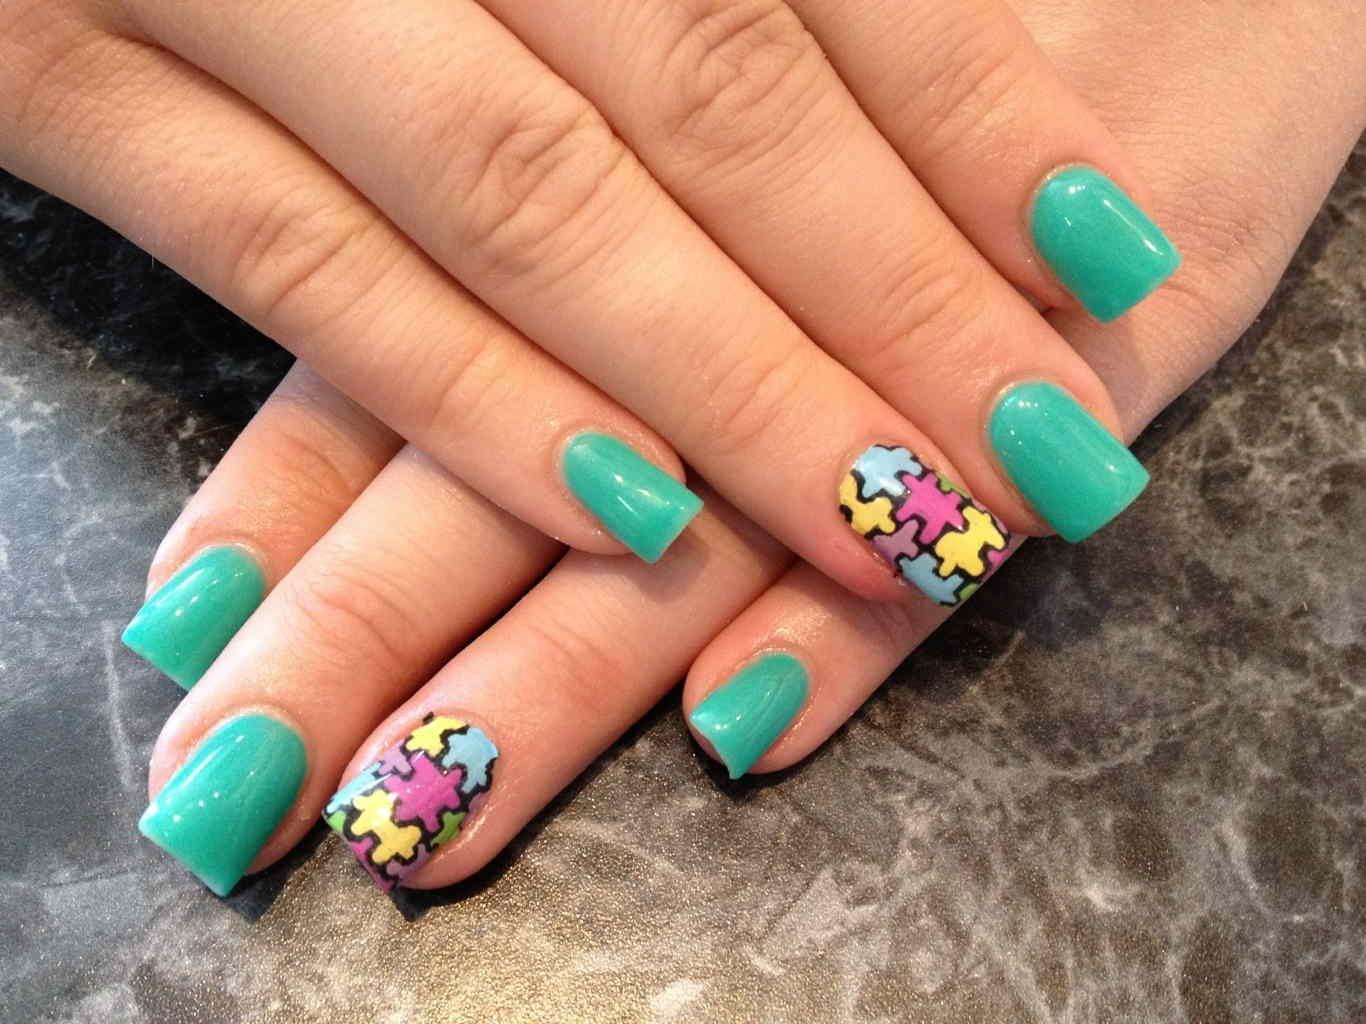 Cute Professional Nail Designs | Great Nail Art Design | Pinterest ...